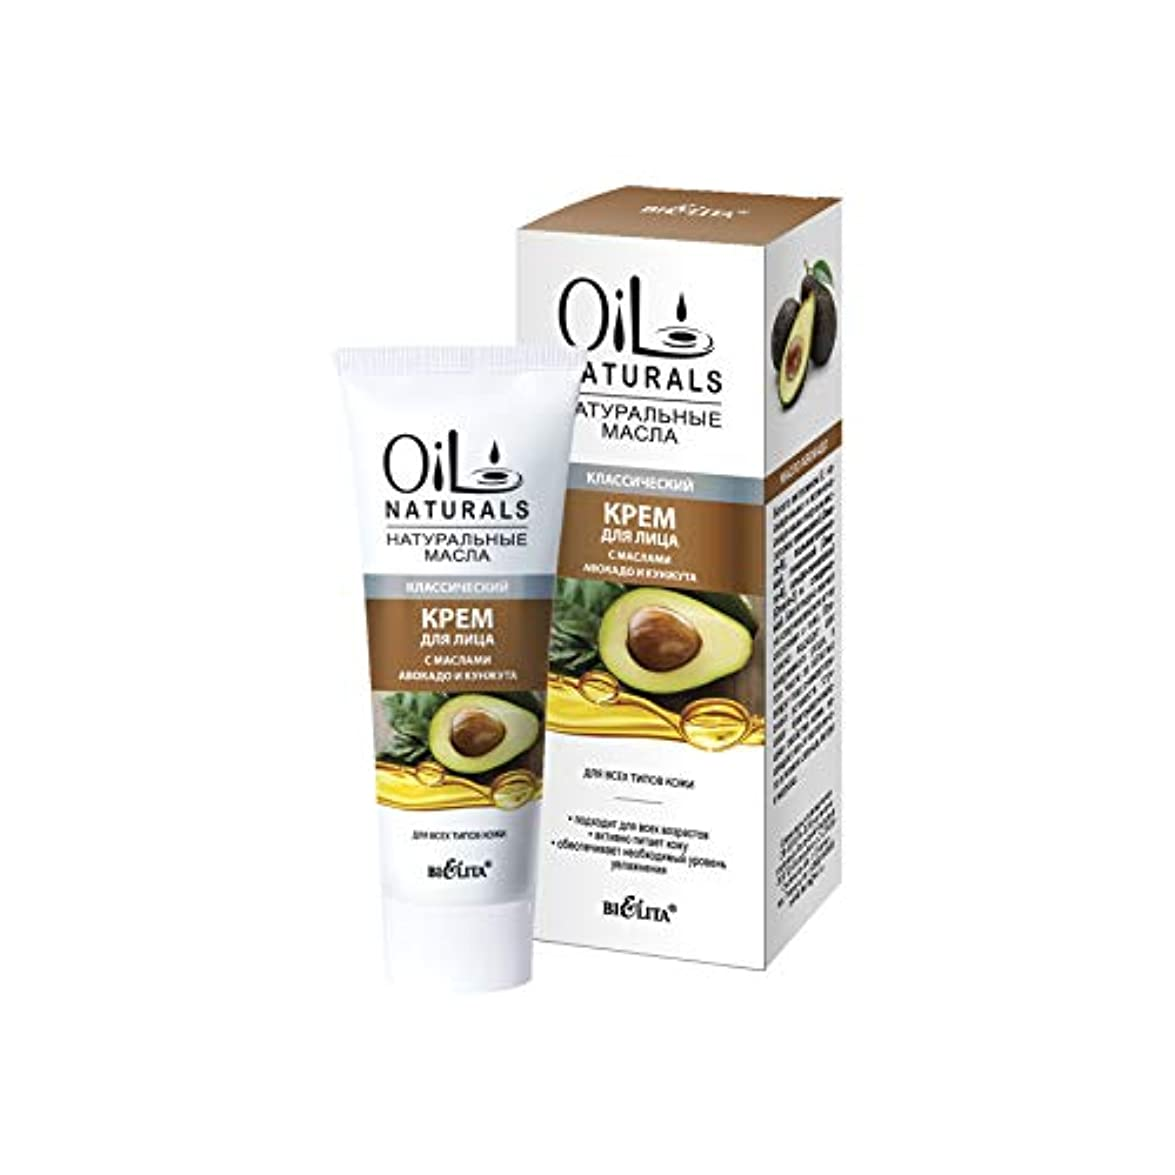 Bielita & Vitex  Oil Naturals Line   Classic Moisturizing Face Cream, for All Skin Types, 50 ml   Avocado Oil,...